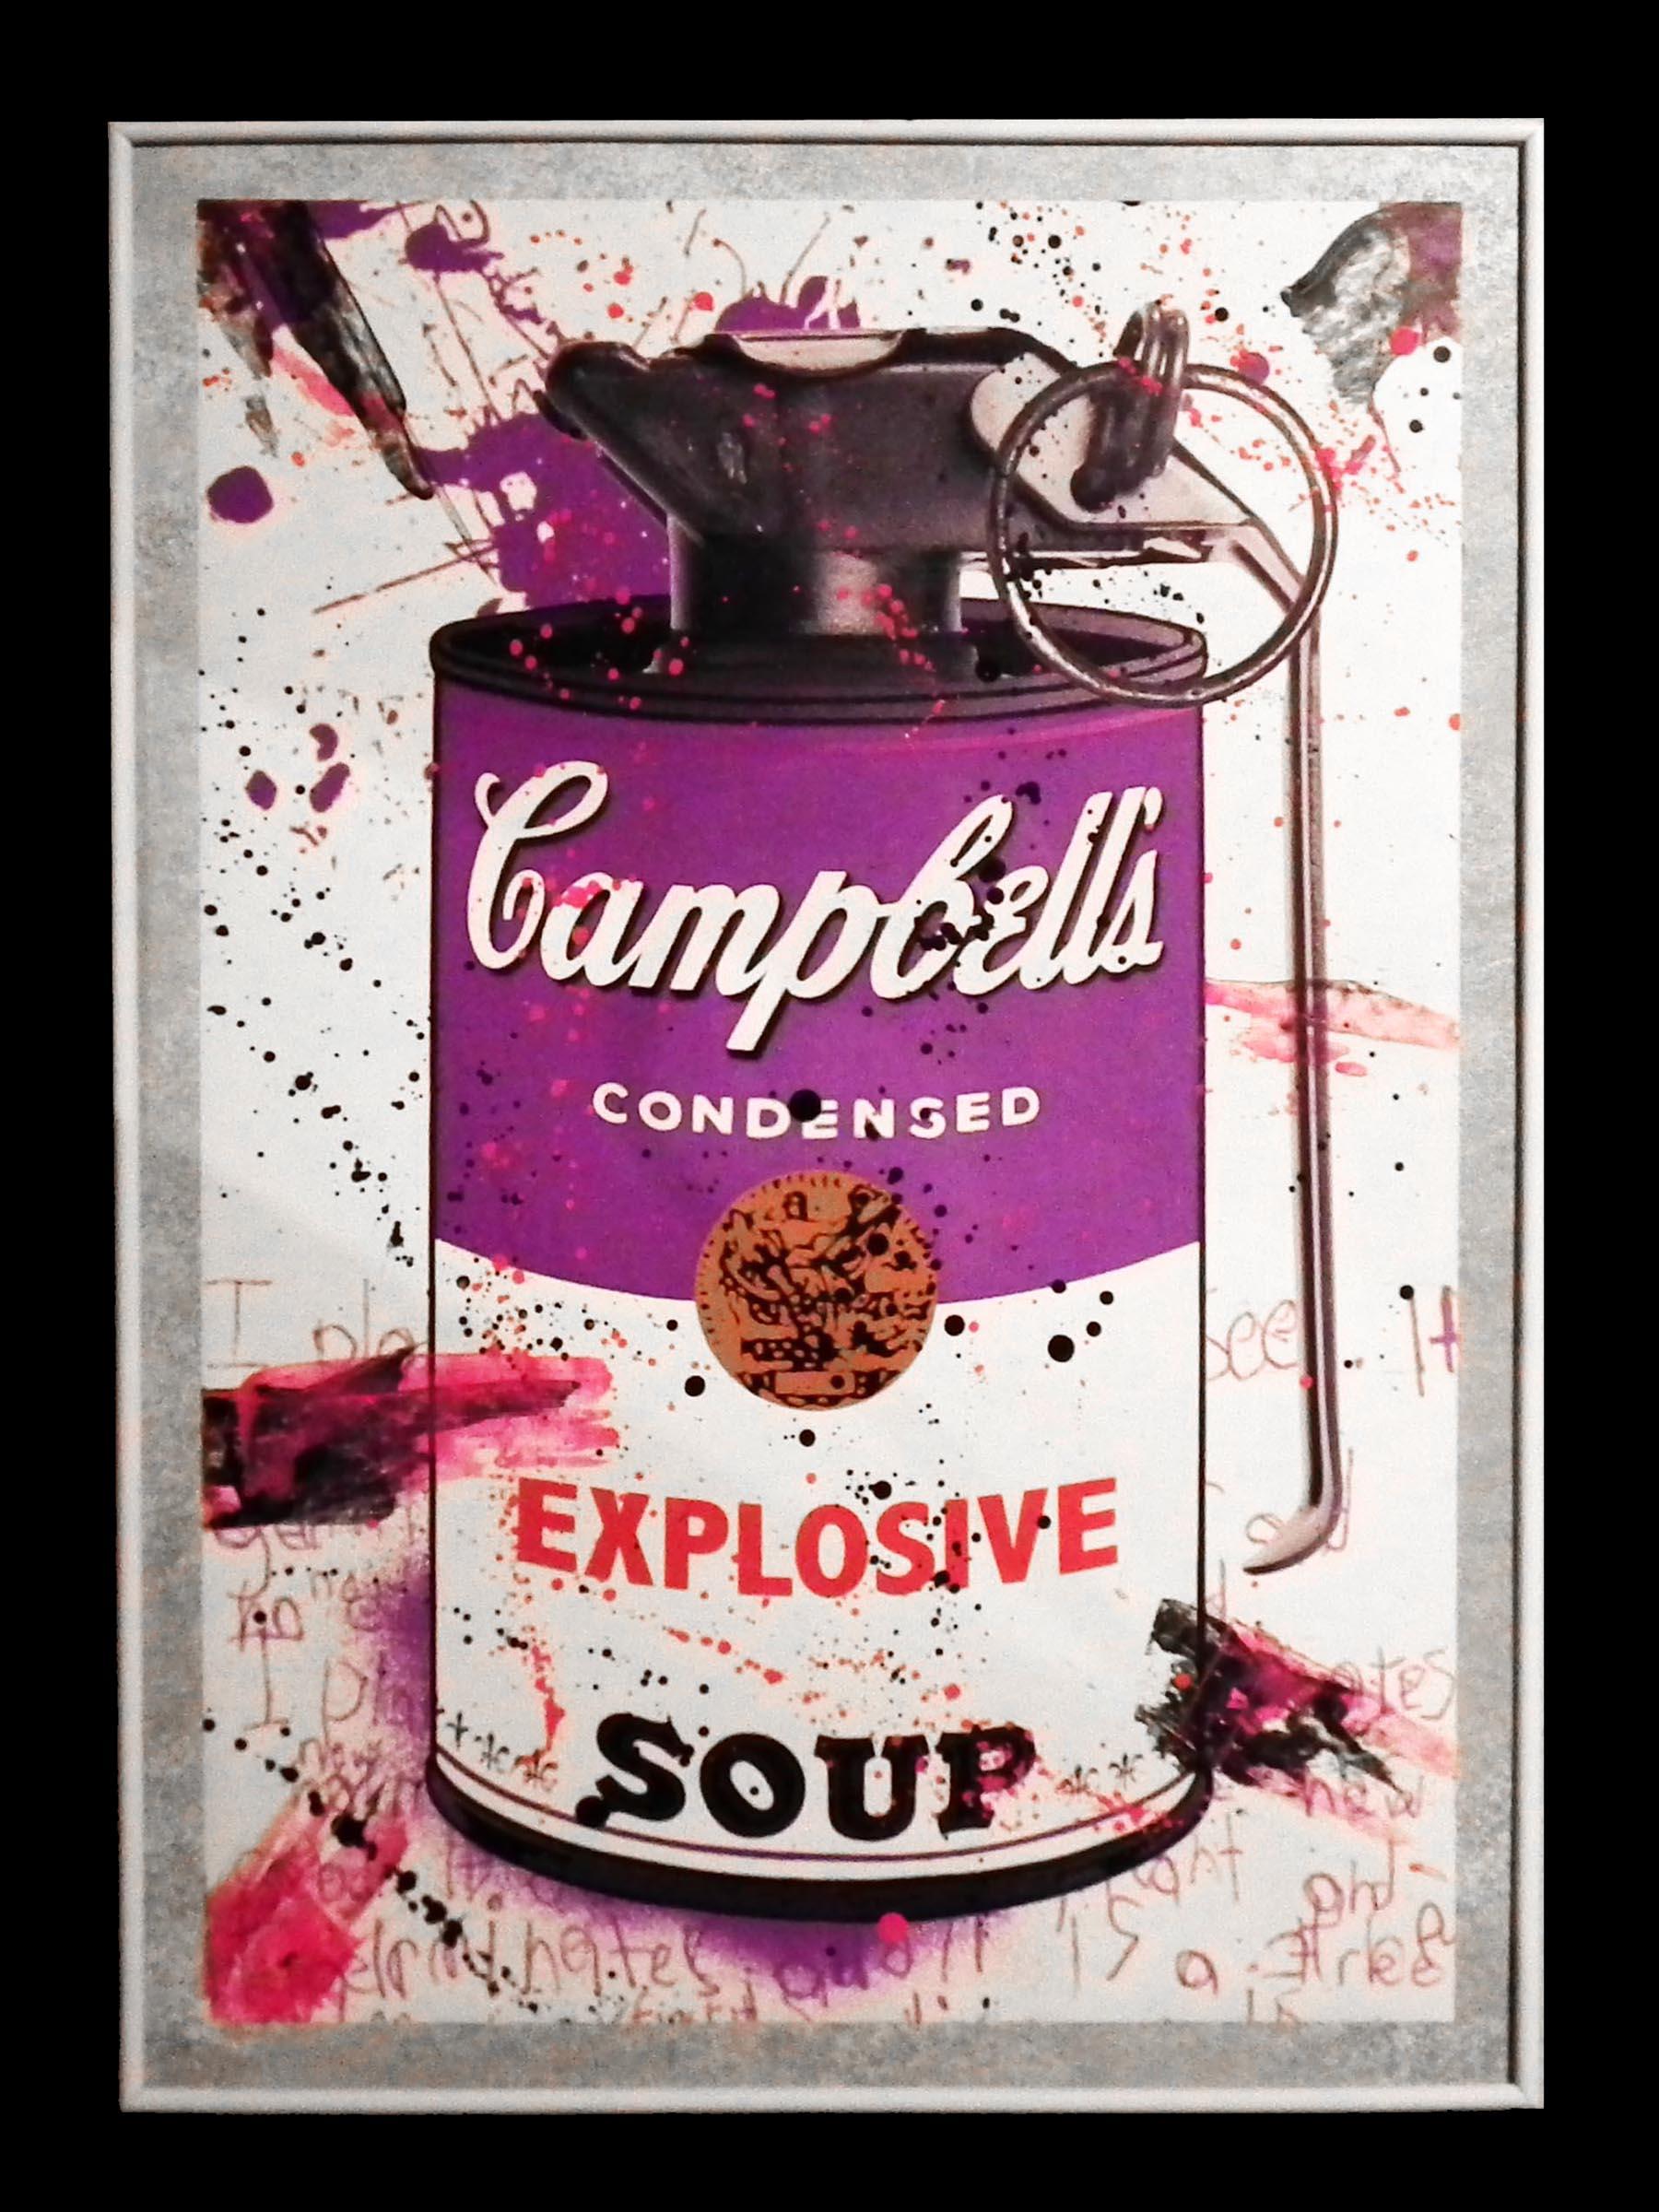 Explosive violet